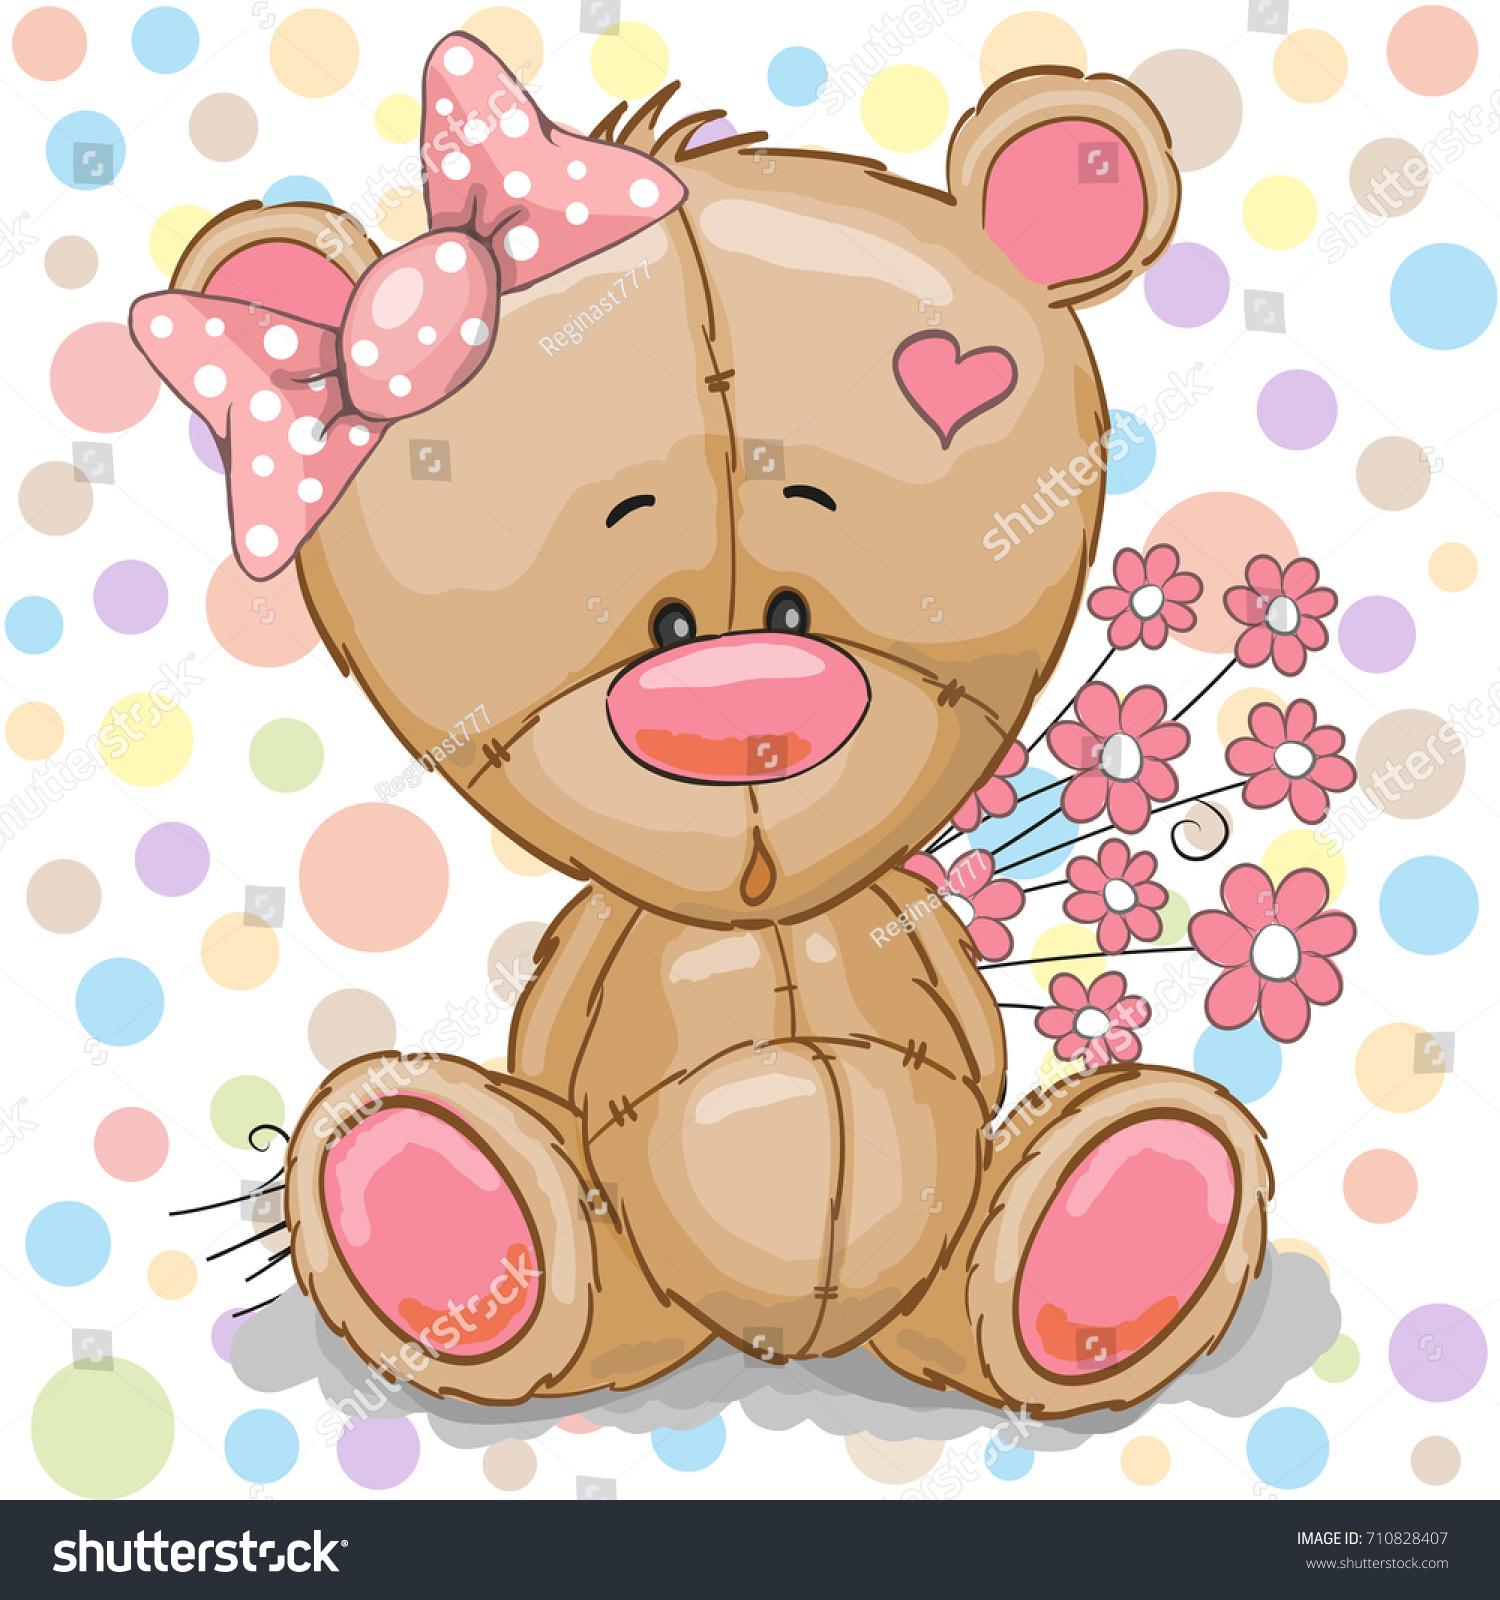 Cute cartoon teddy bear girl pink stock vector royalty free cute cartoon teddy bear girl with pink flowers mightylinksfo